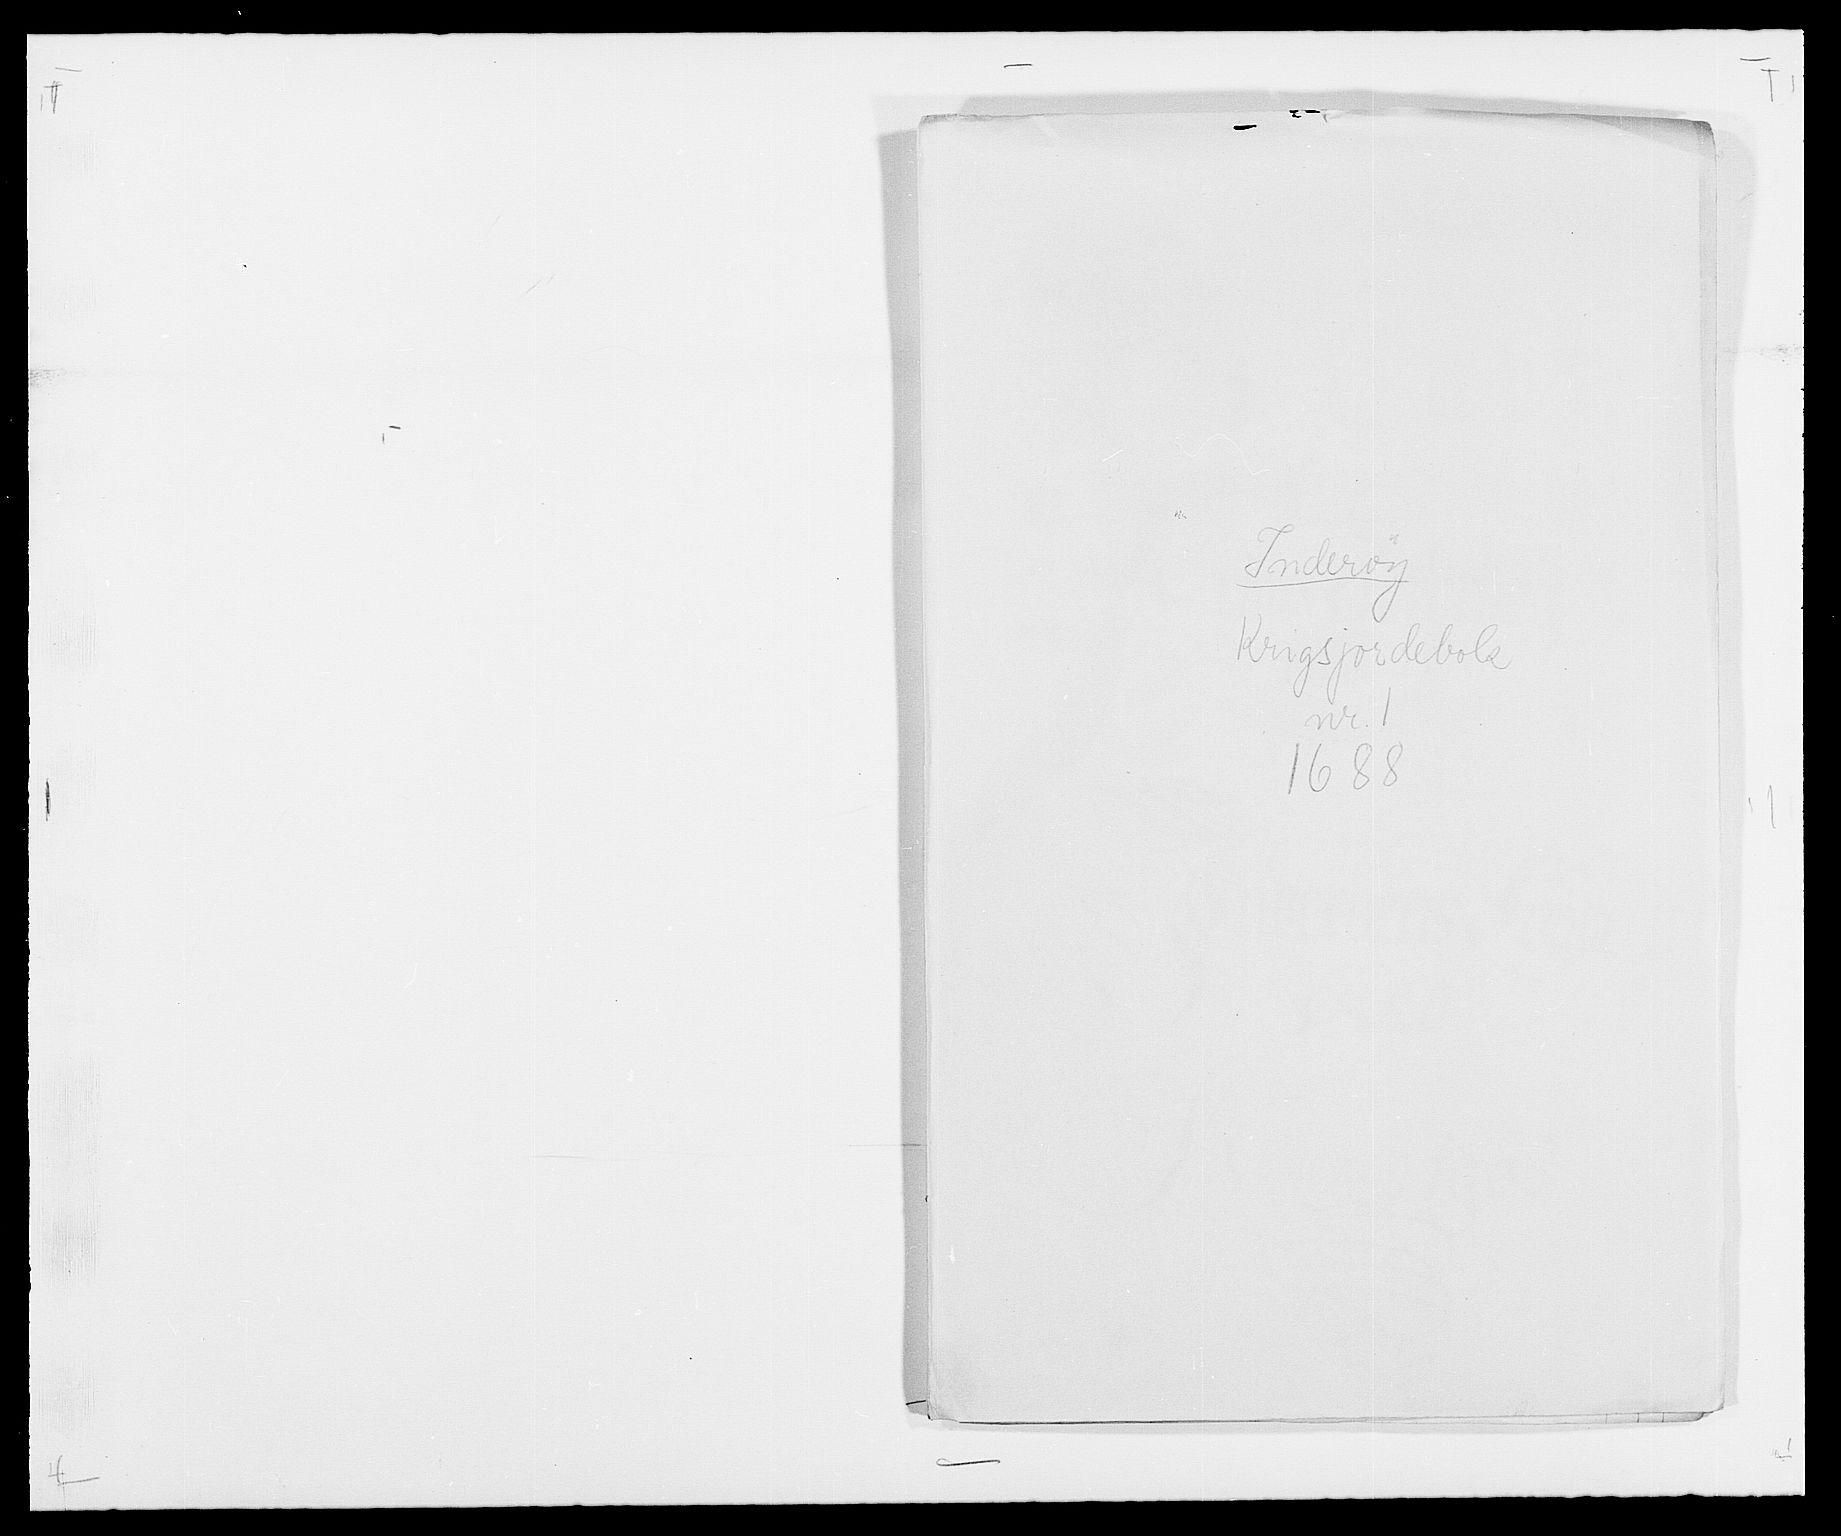 RA, Rentekammeret inntil 1814, Reviderte regnskaper, Fogderegnskap, R63/L4306: Fogderegnskap Inderøy, 1687-1689, s. 346